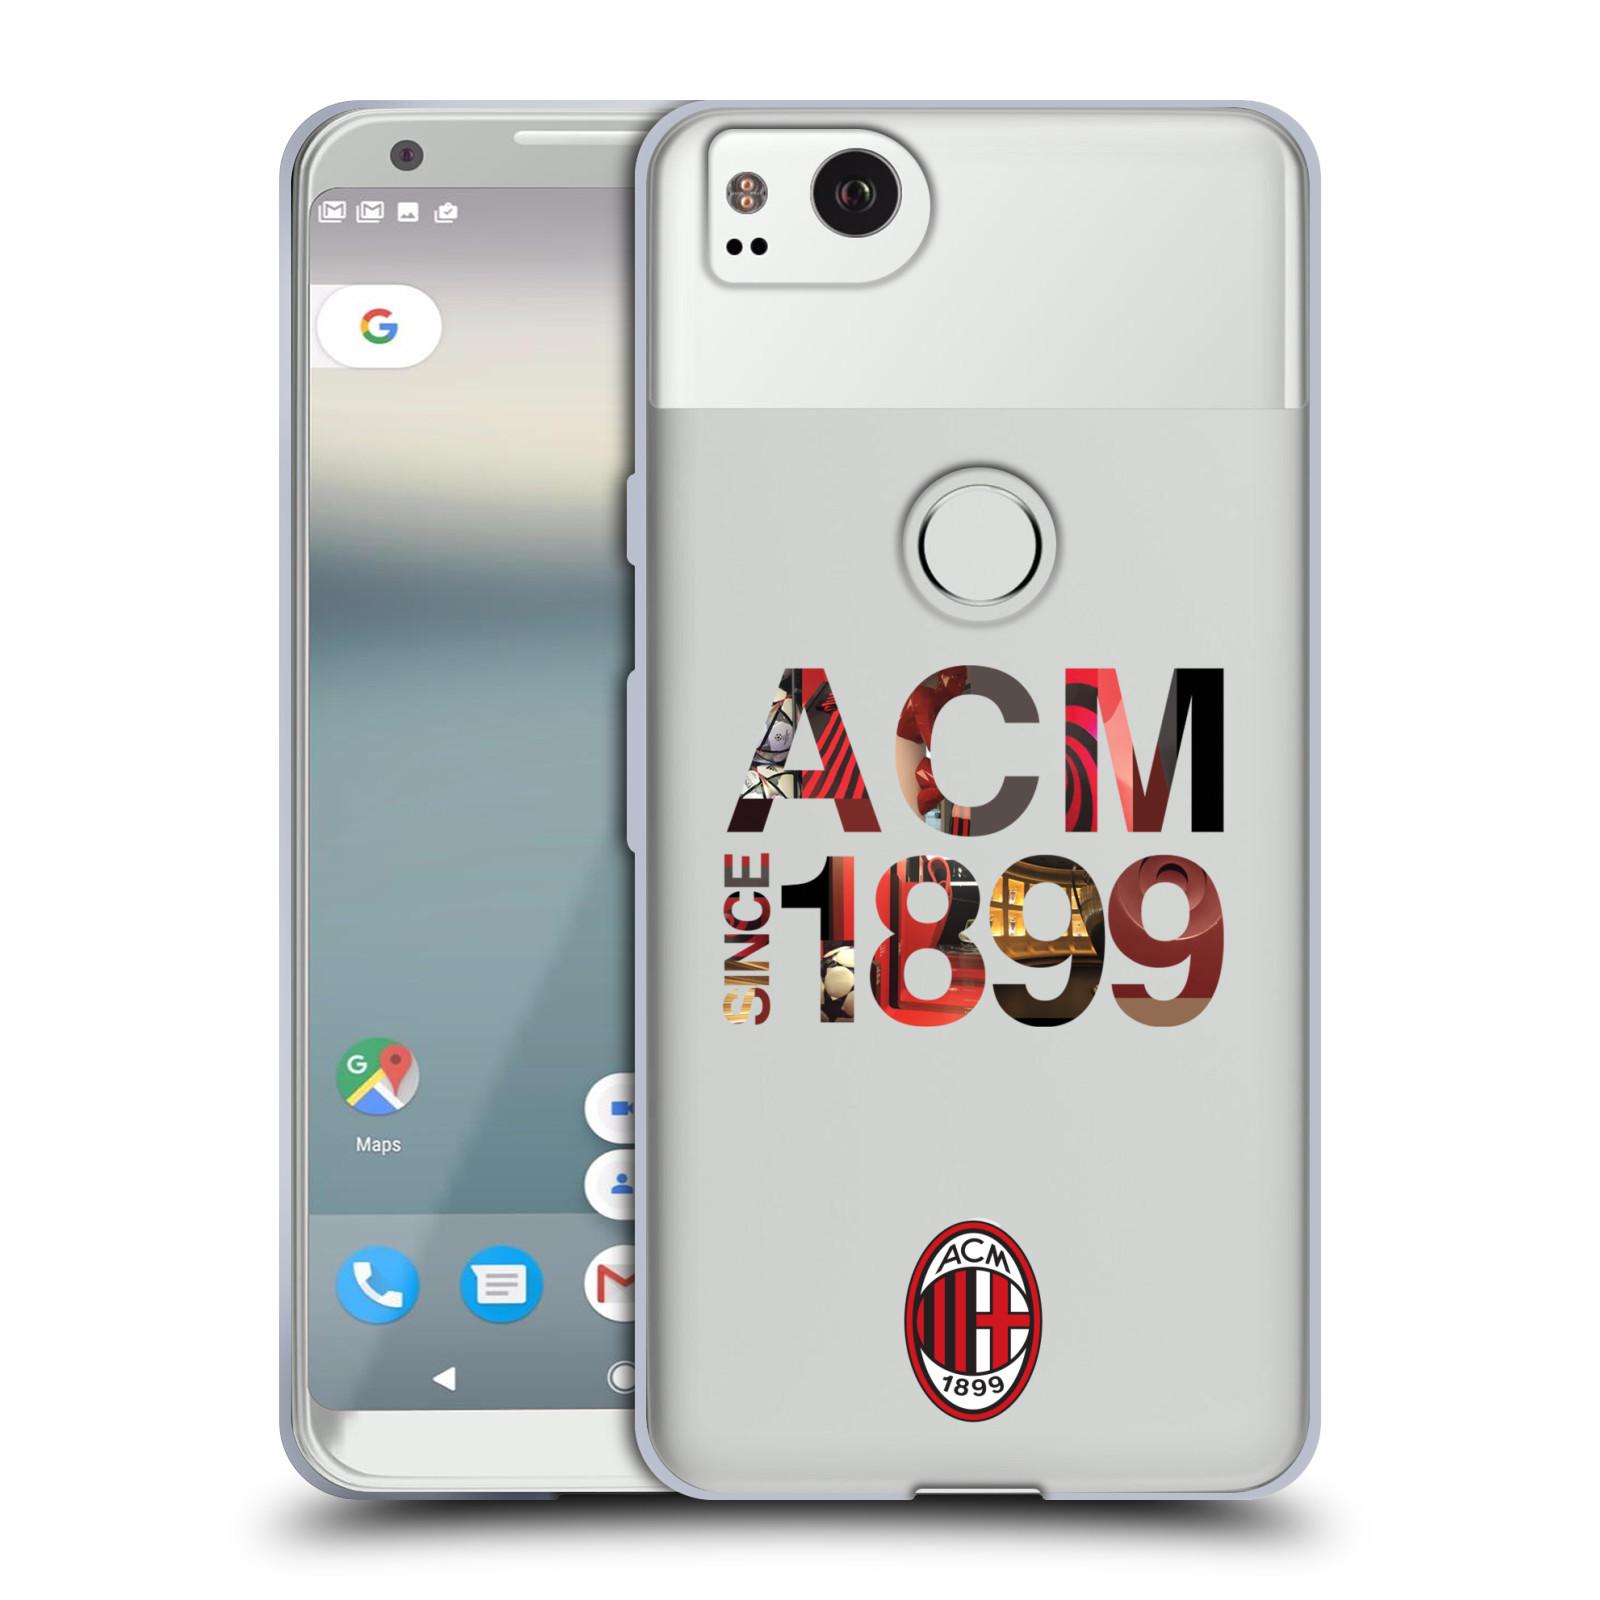 Oficial-AC-Milan-2018-19-Adultos-Gel-Suave-Estuche-Para-Amazon-Asus-oneplus